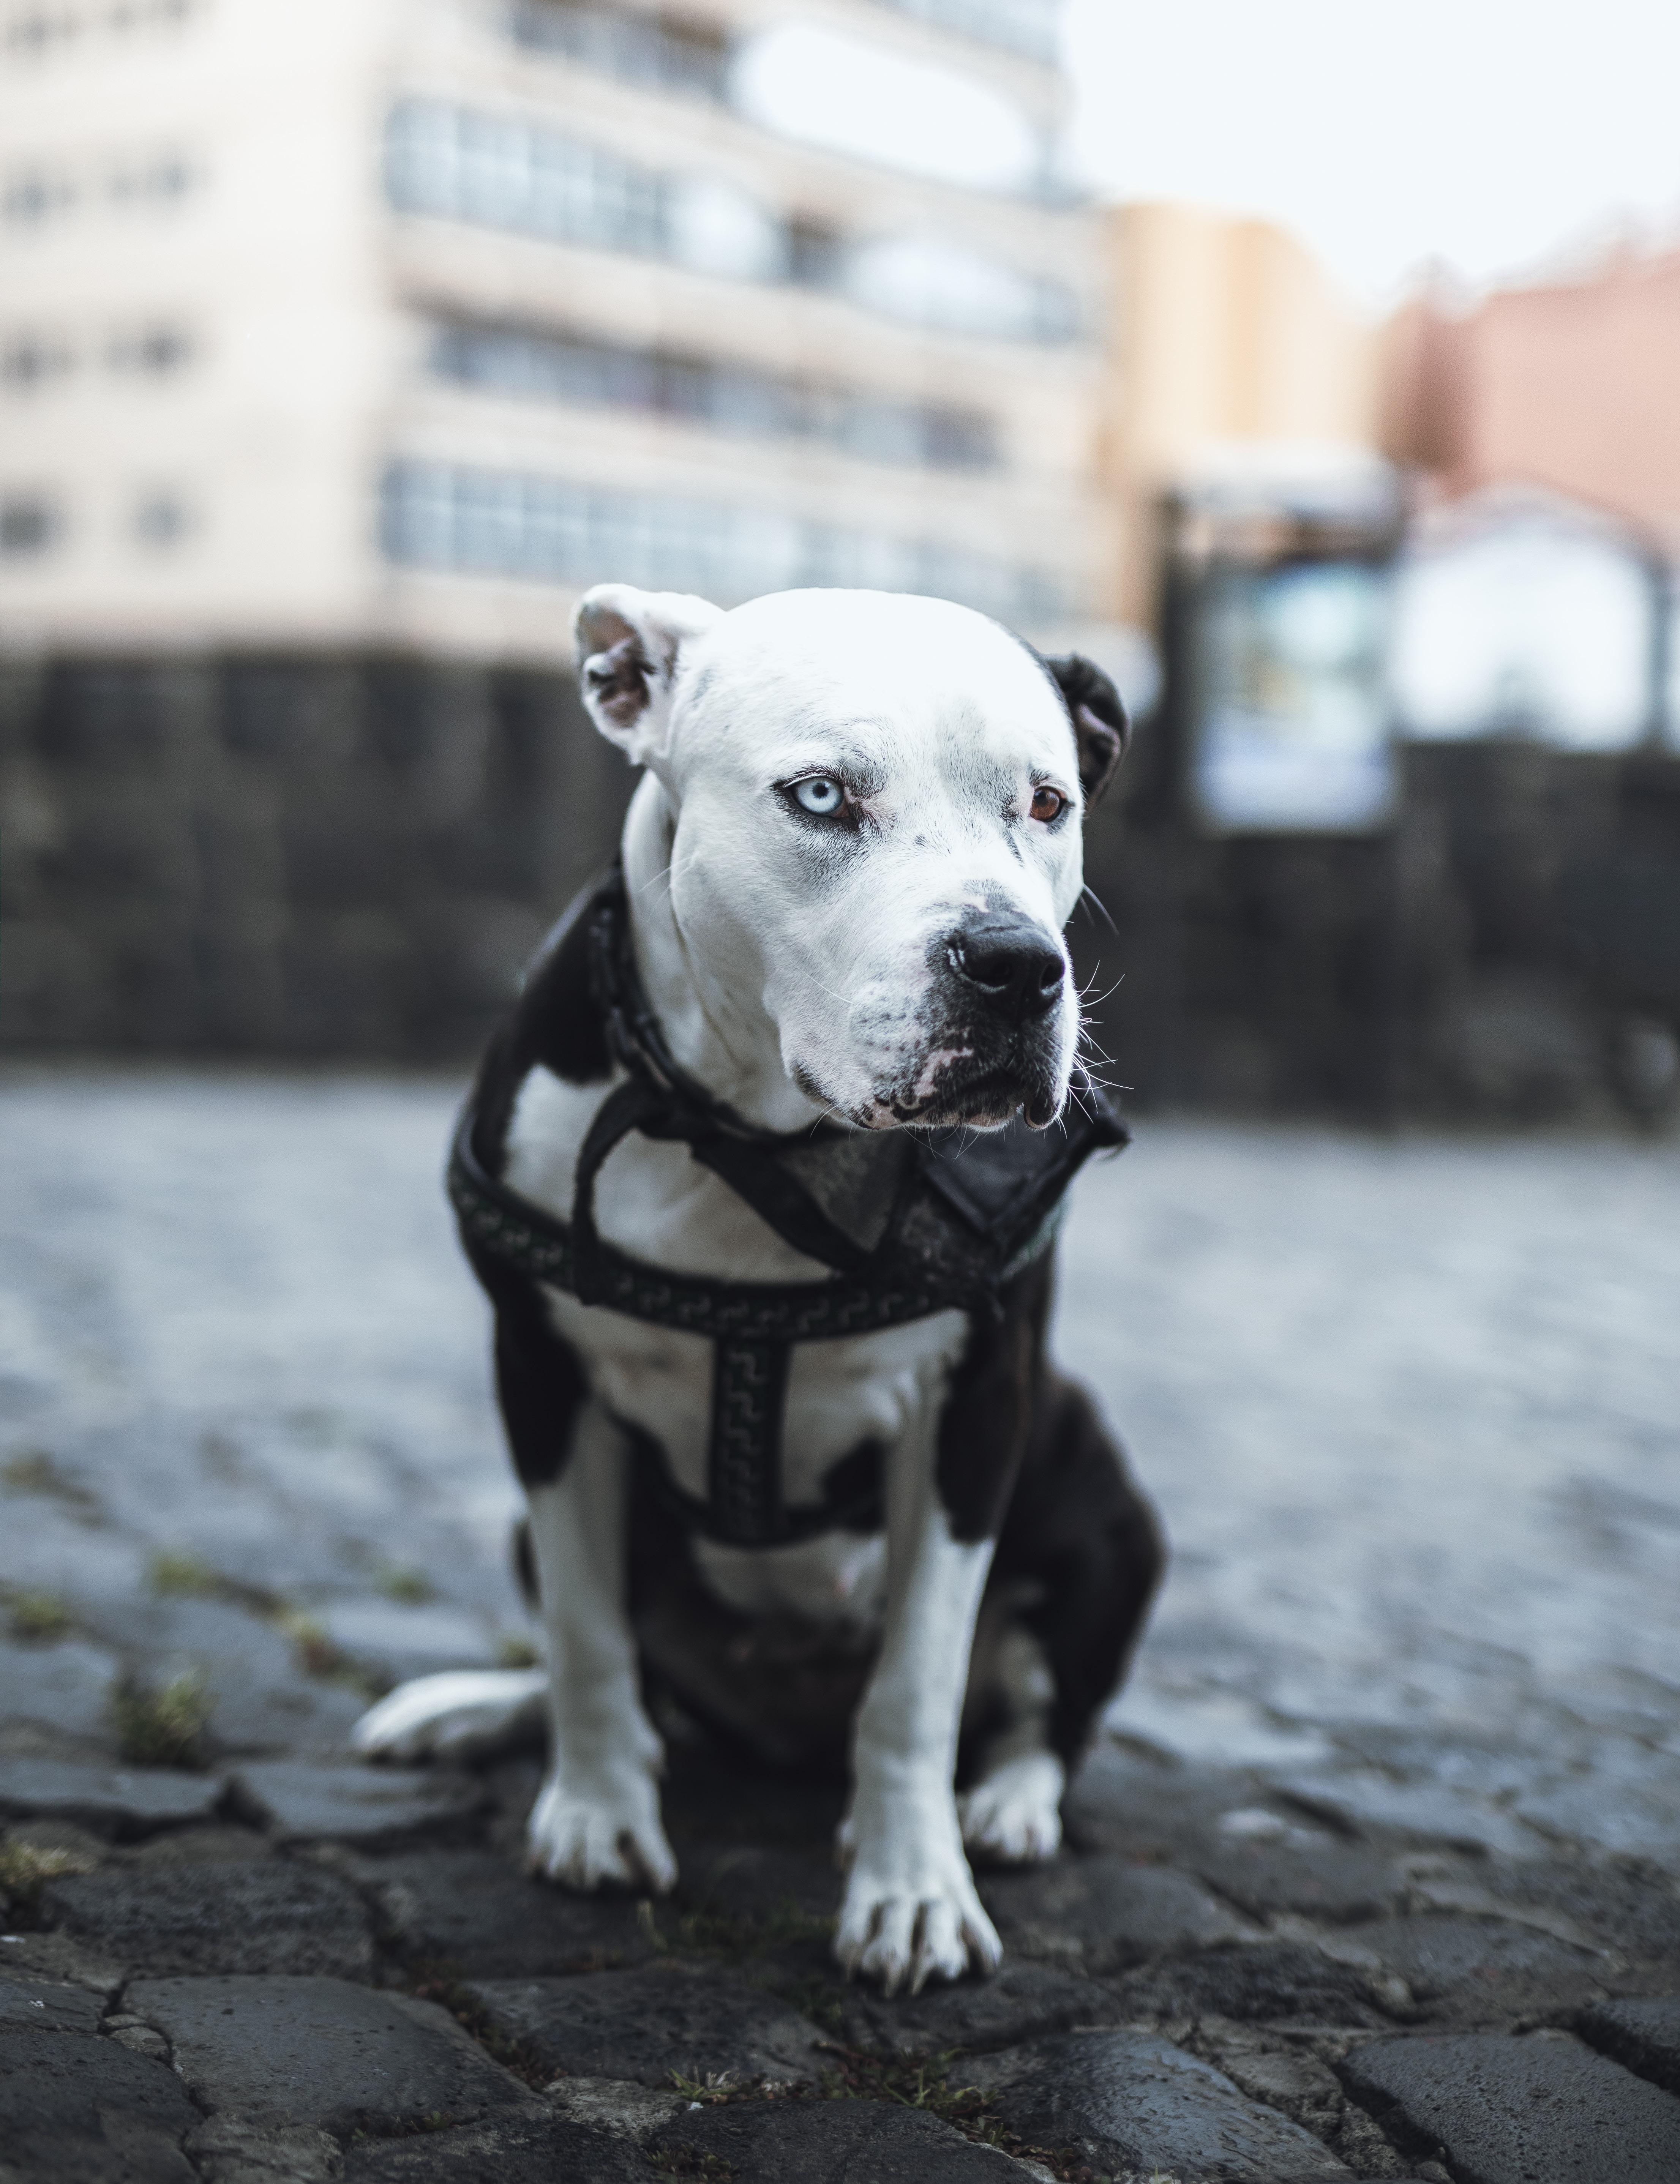 grey scale photography of dog sitting on ground